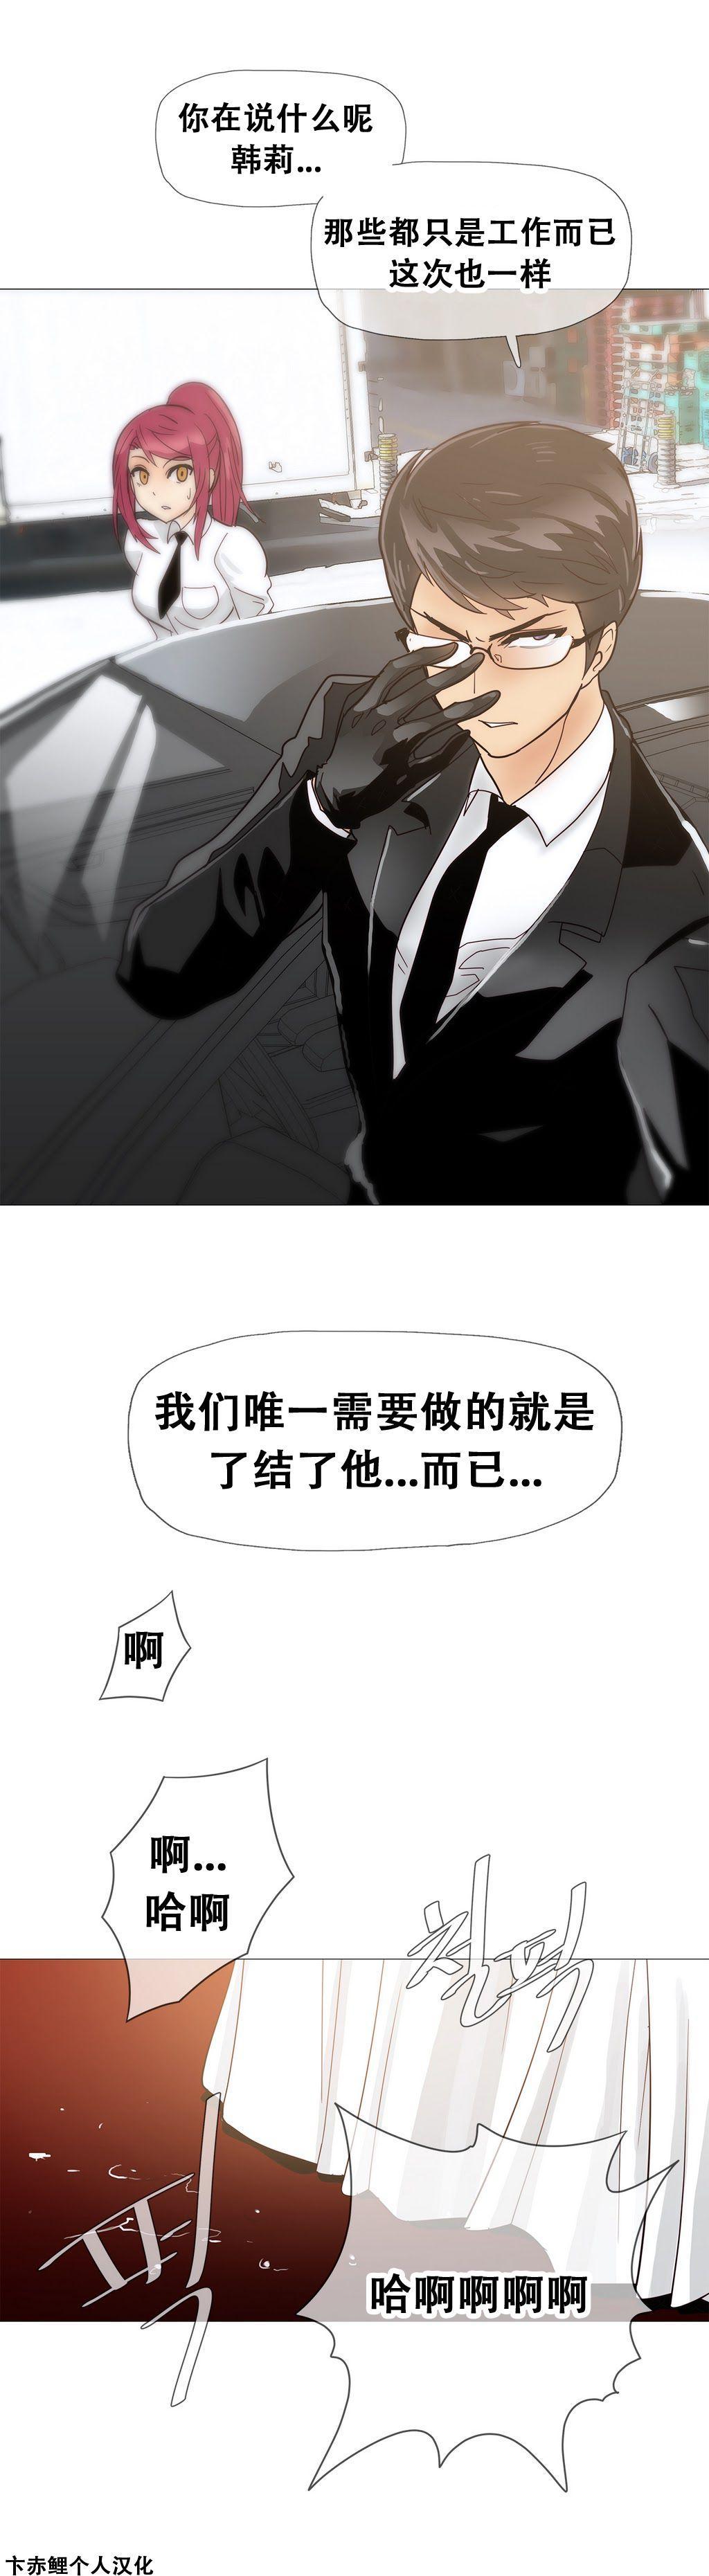 HouseHold Affairs 【卞赤鲤个人汉化】1~21话(持续更新中) 300